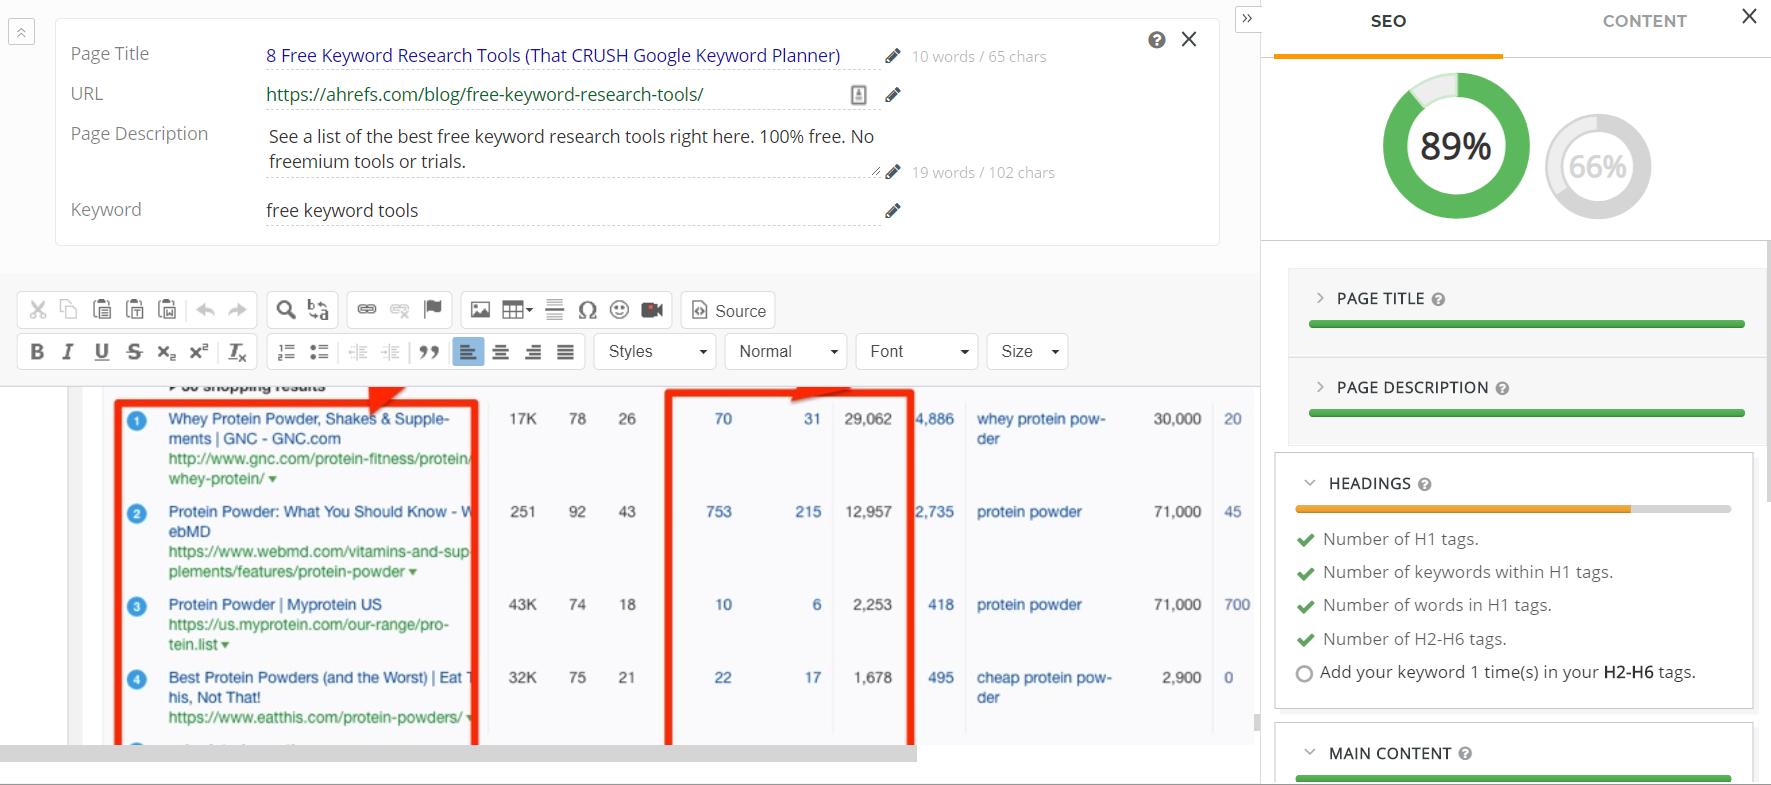 webtexttool competitor analysis - SEO Toolkit